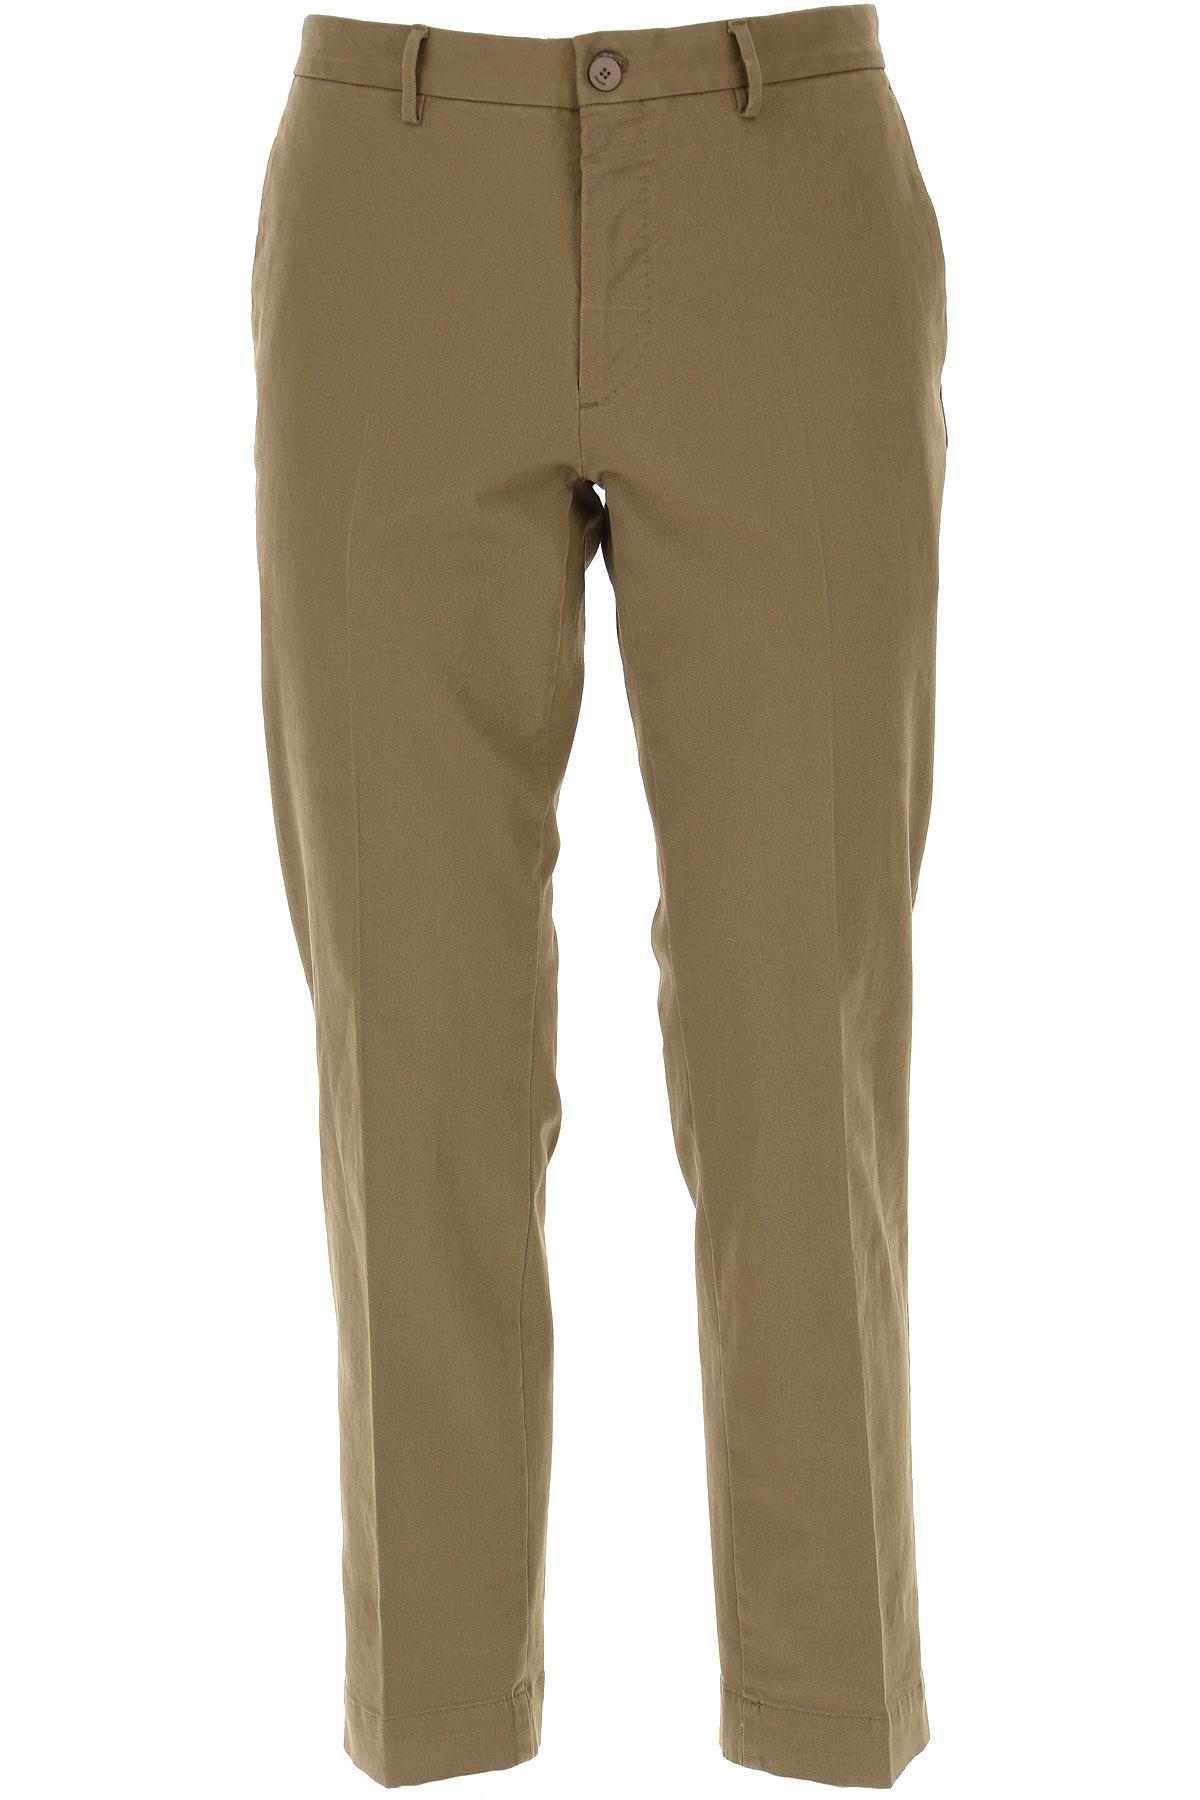 Incotex Pants for Men On Sale, Mud, Cotton, 2019, 32 34